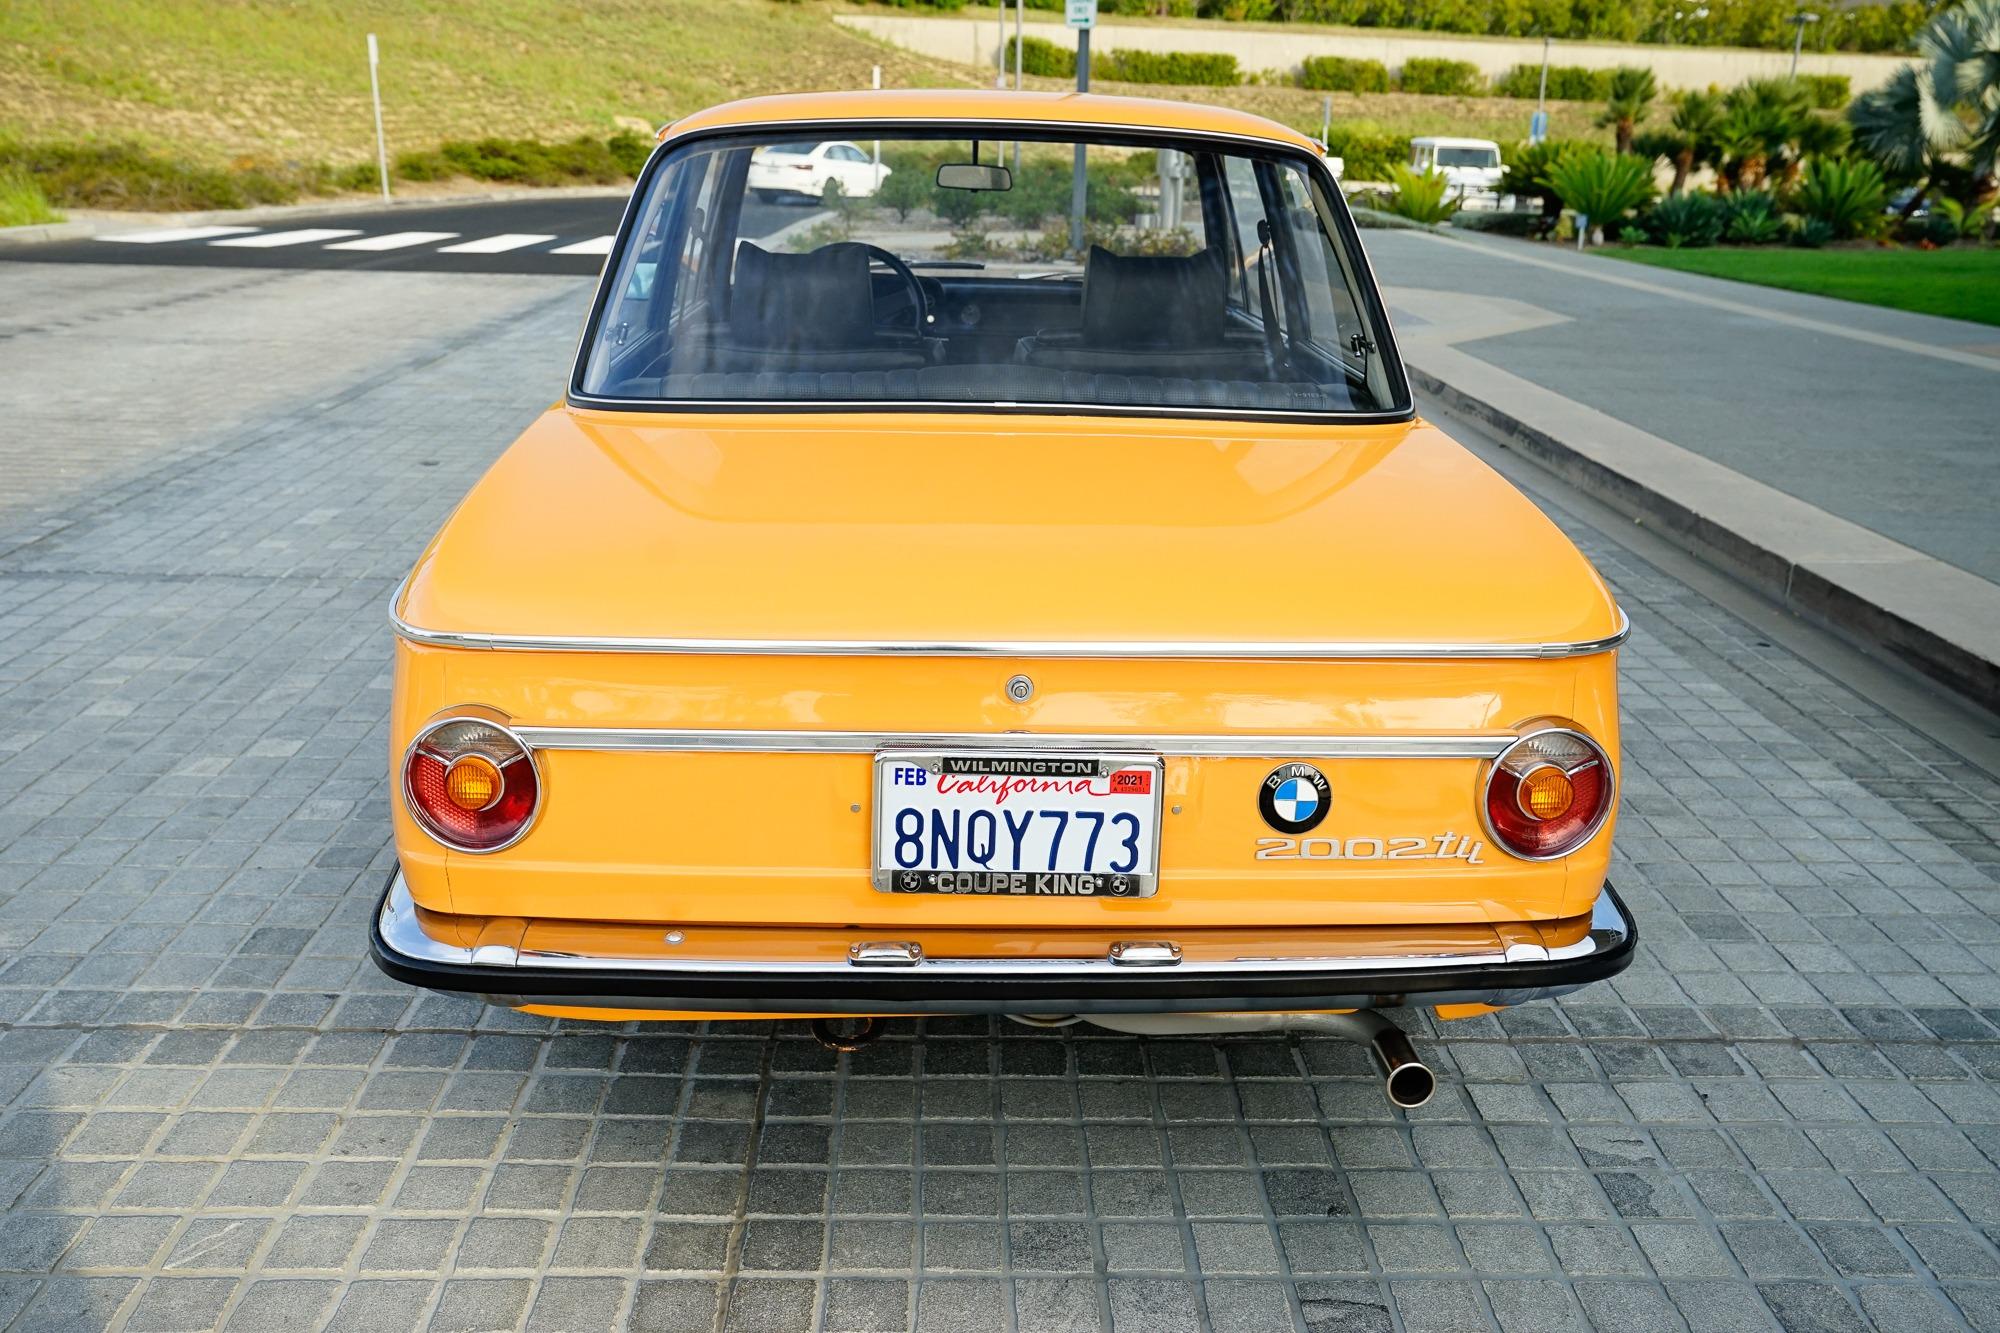 1972 Bmw 2002 Tii Colorado Orange Italian Car Bmw 2002 And Neue Klasse Cars For Sale Wanted Bmw 2002 Faq